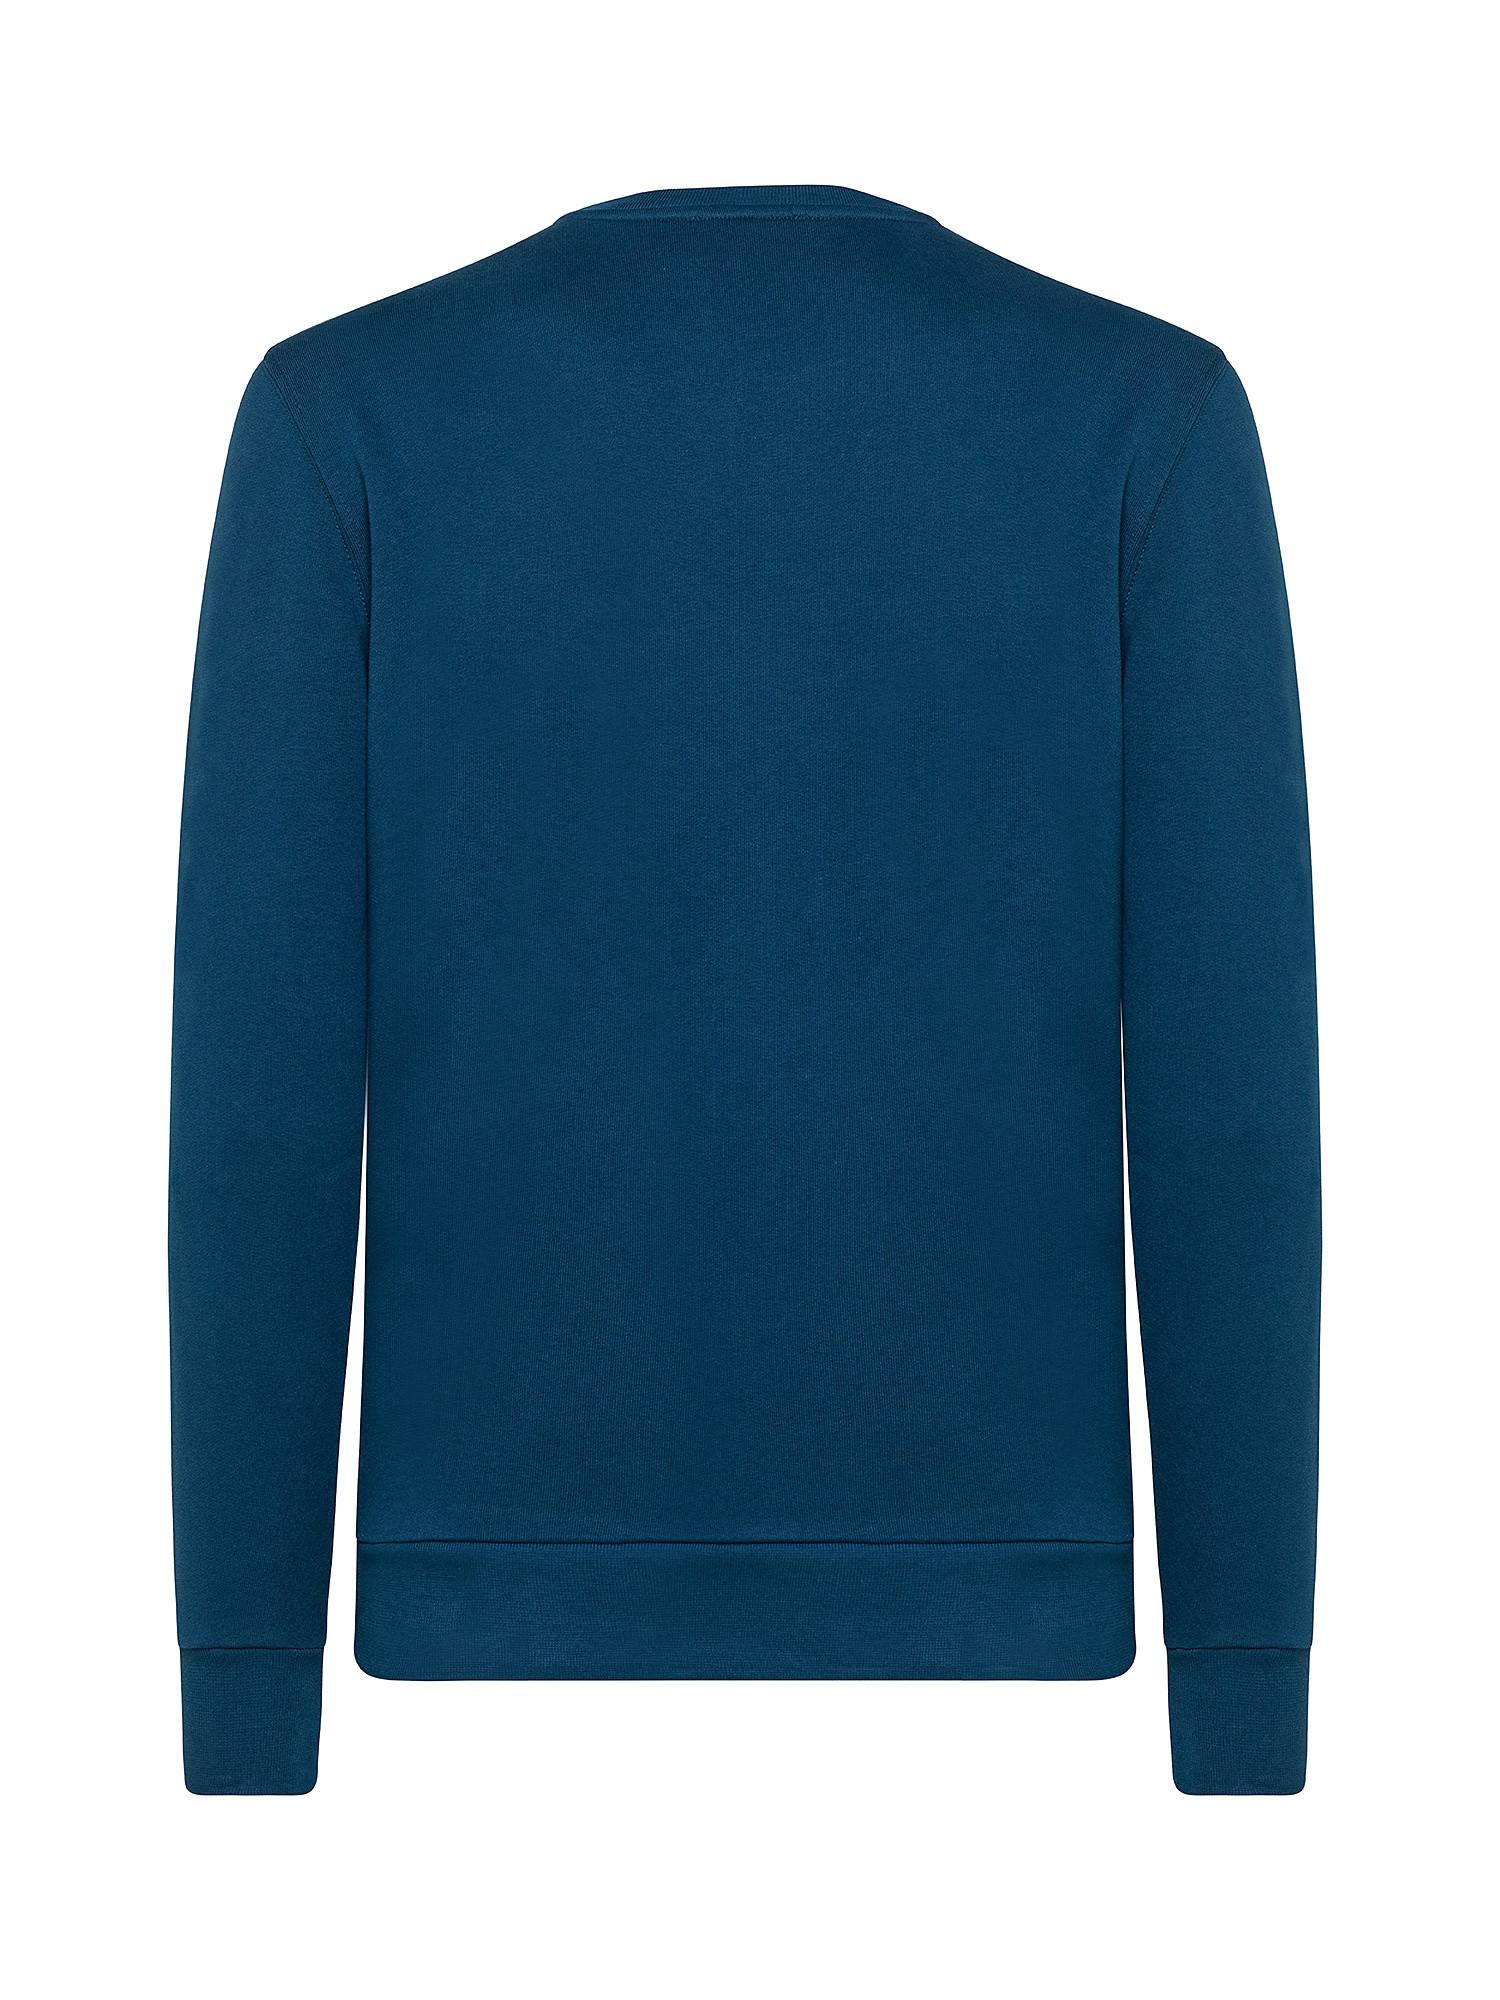 Felpa in cotone organico, Blu, large image number 1